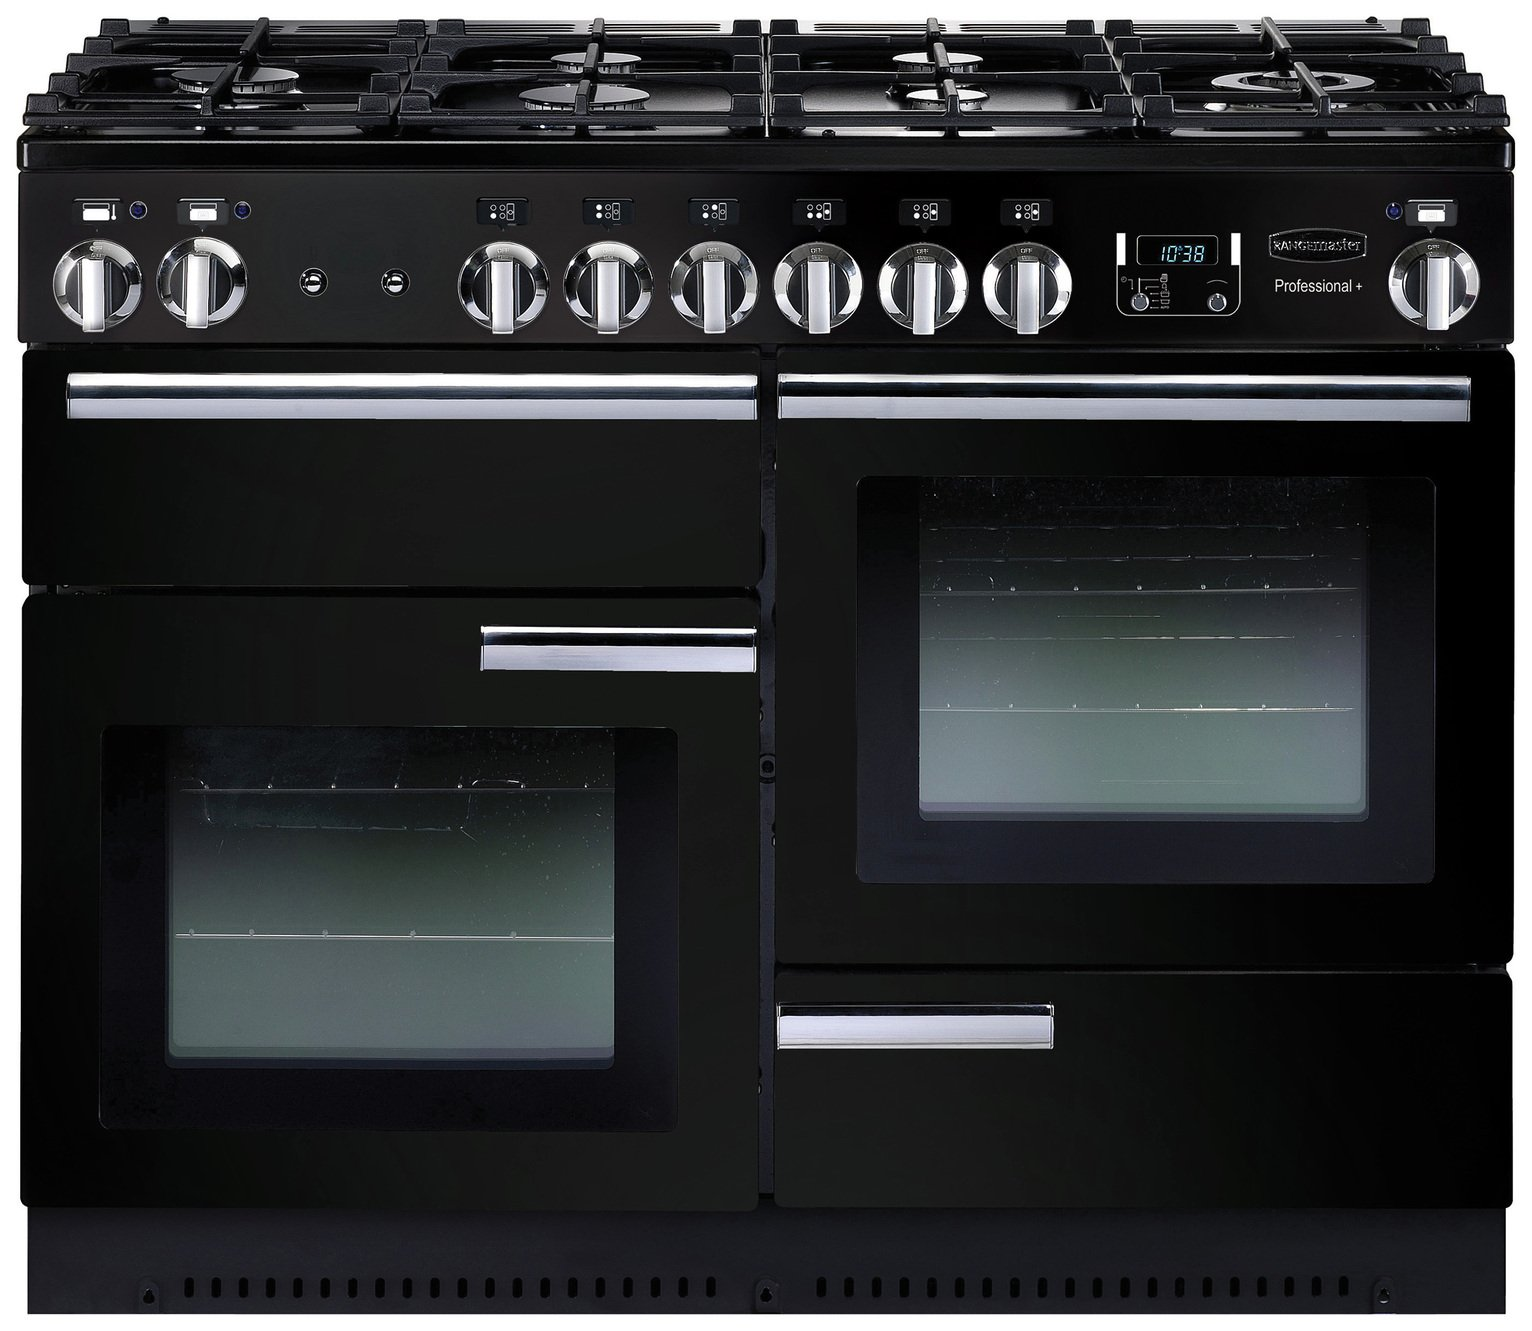 Rangemaster Professional 110 Dual Fuel Range Cooker - Black